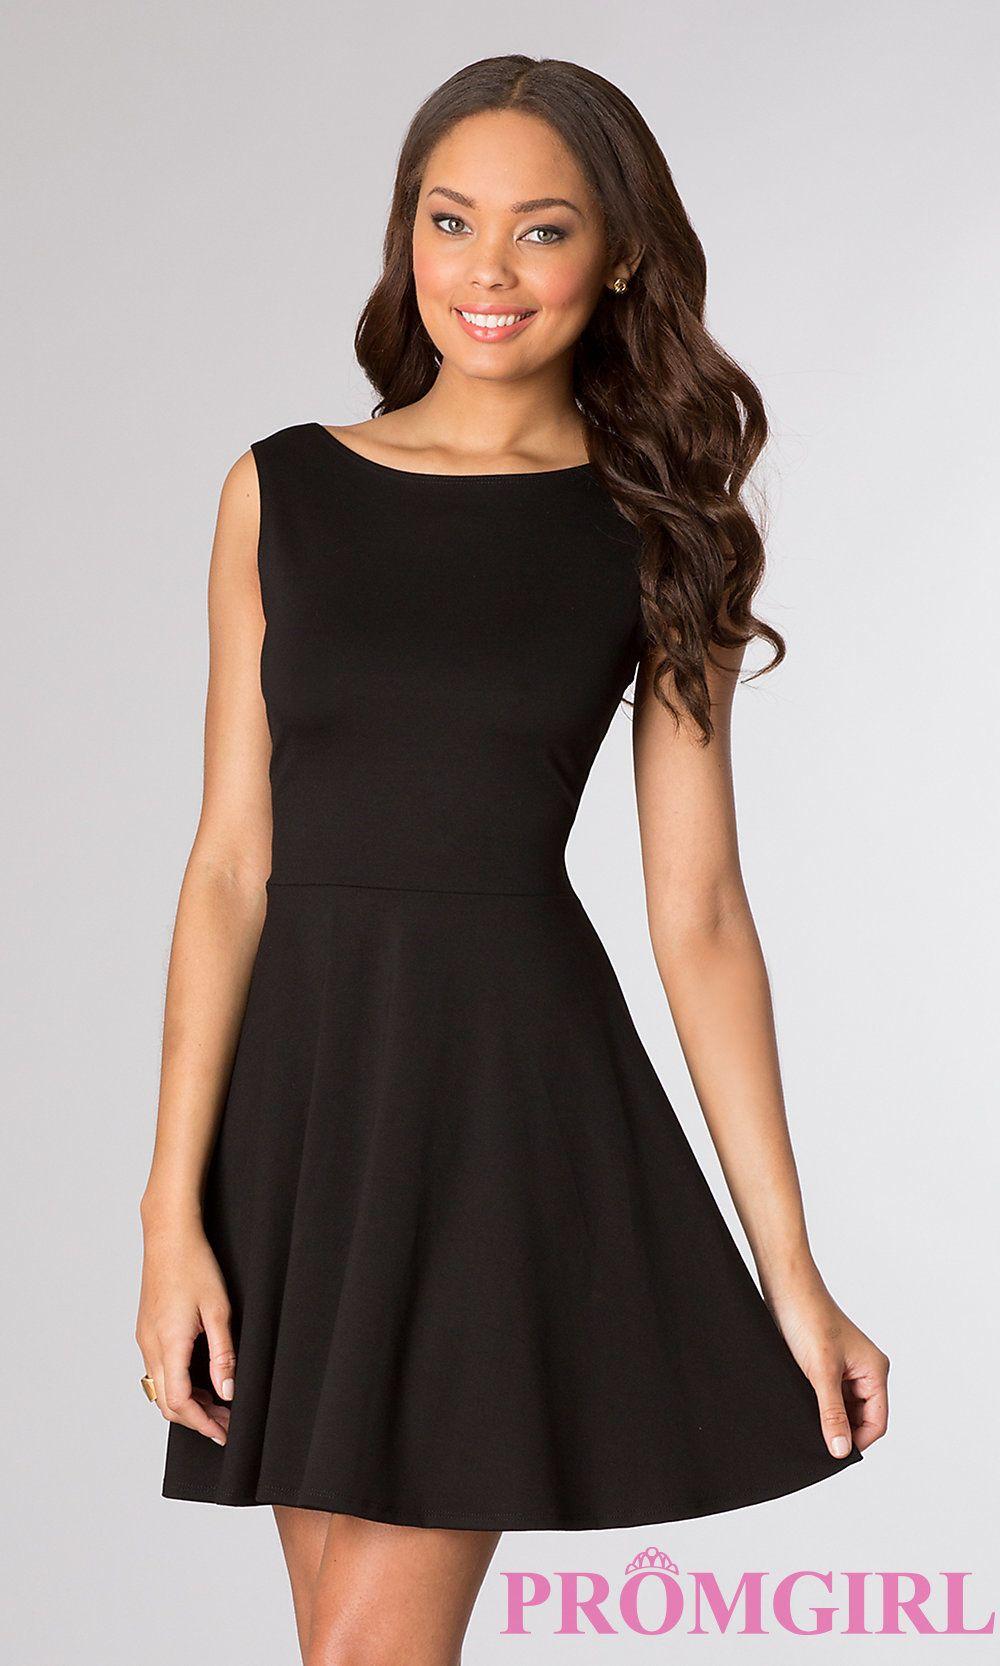 Fustana 2015 modele te fustanave 2015 dresses 2015 fustana modele te - Short Dresses Google Search